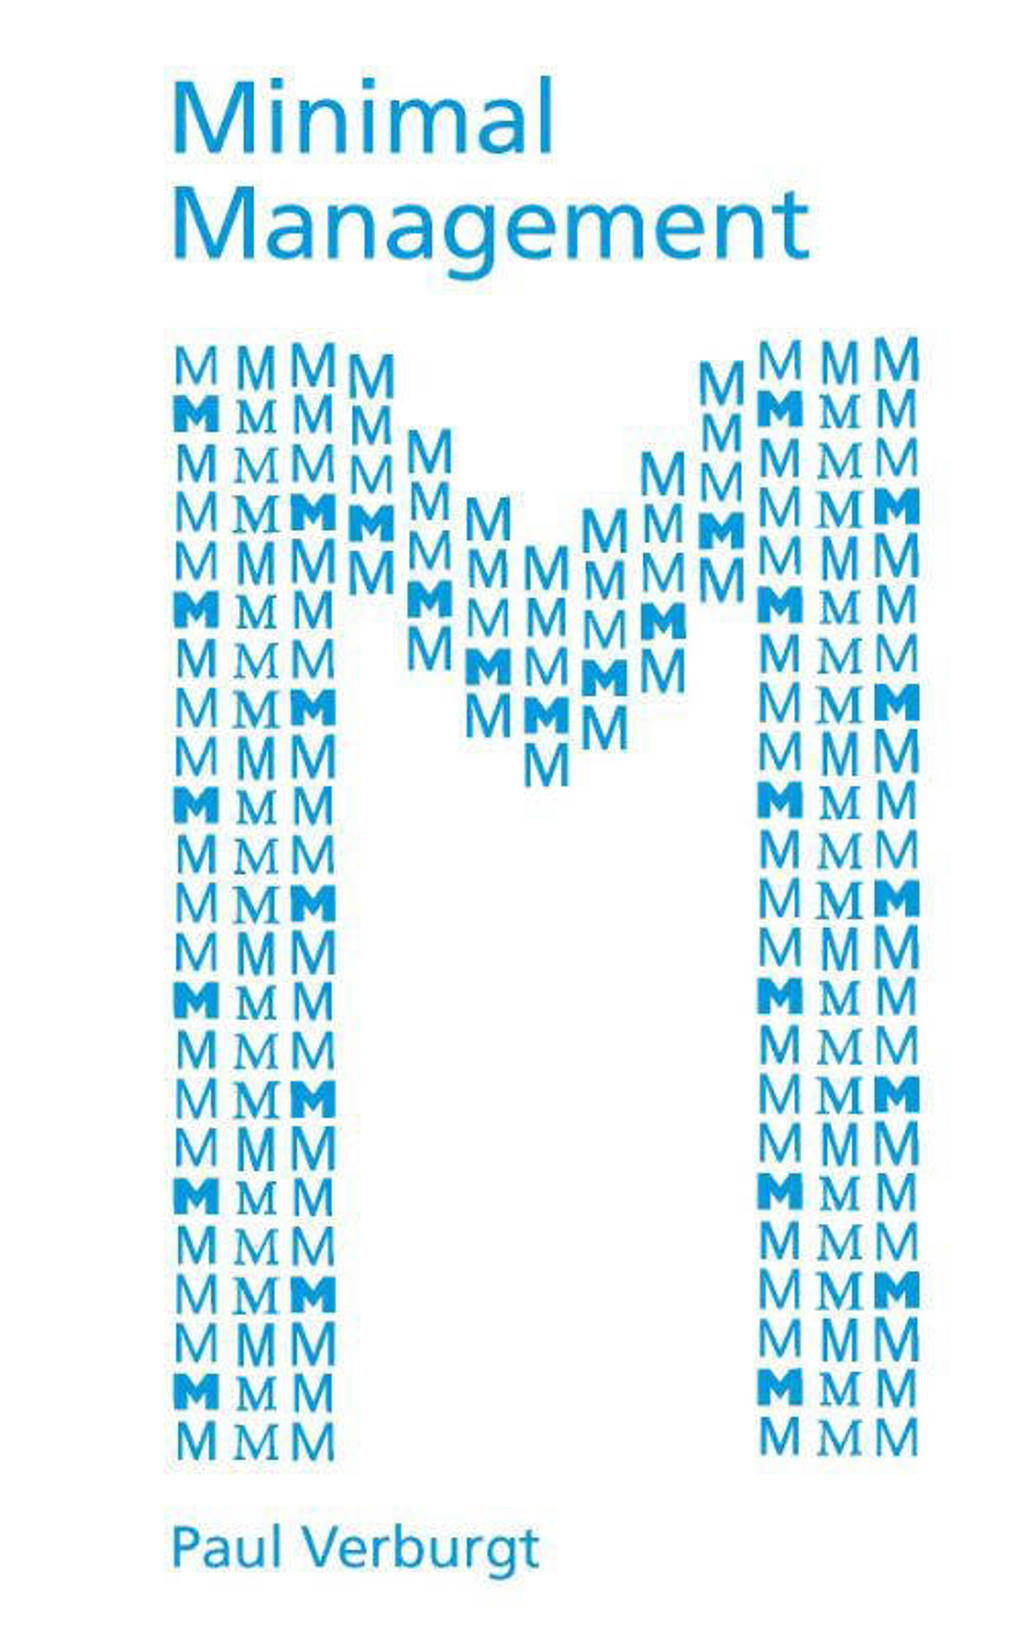 Minimal Management - Paul Verburgt